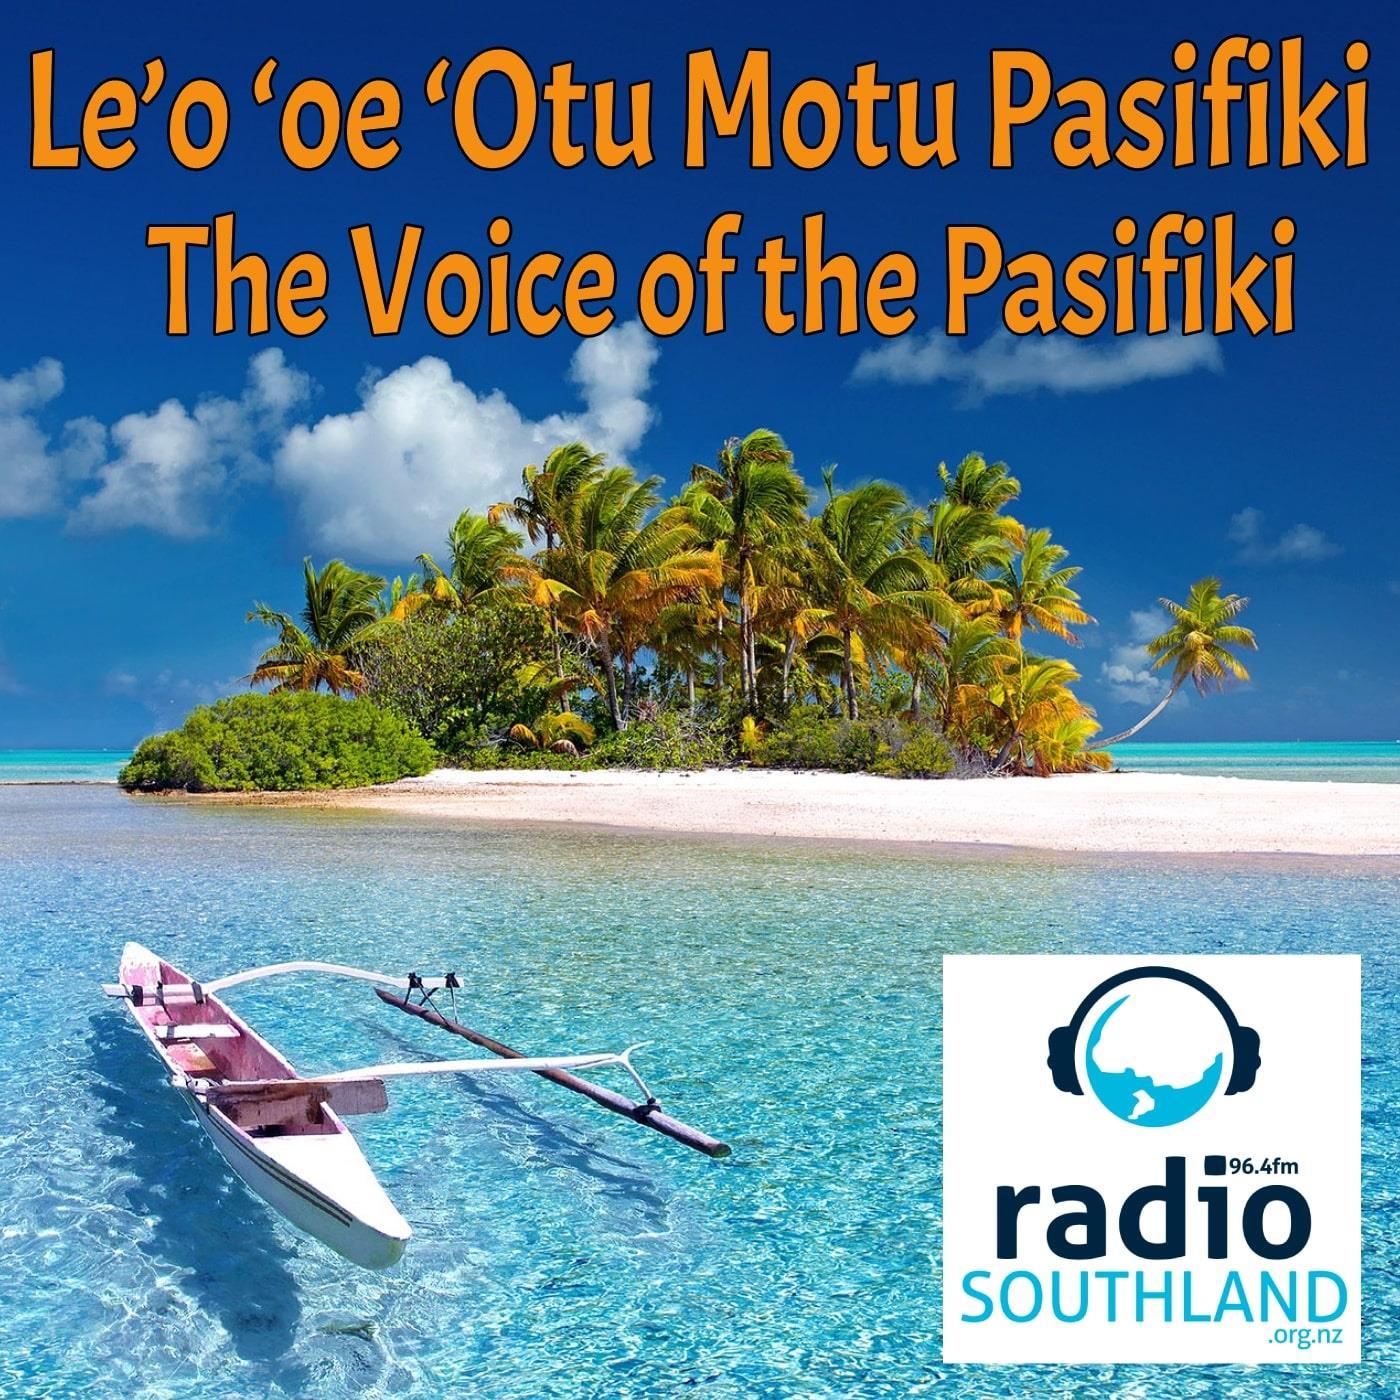 Le'o 'oe 'Otu Motu Pasifiki - The Voice of the Pasifiki